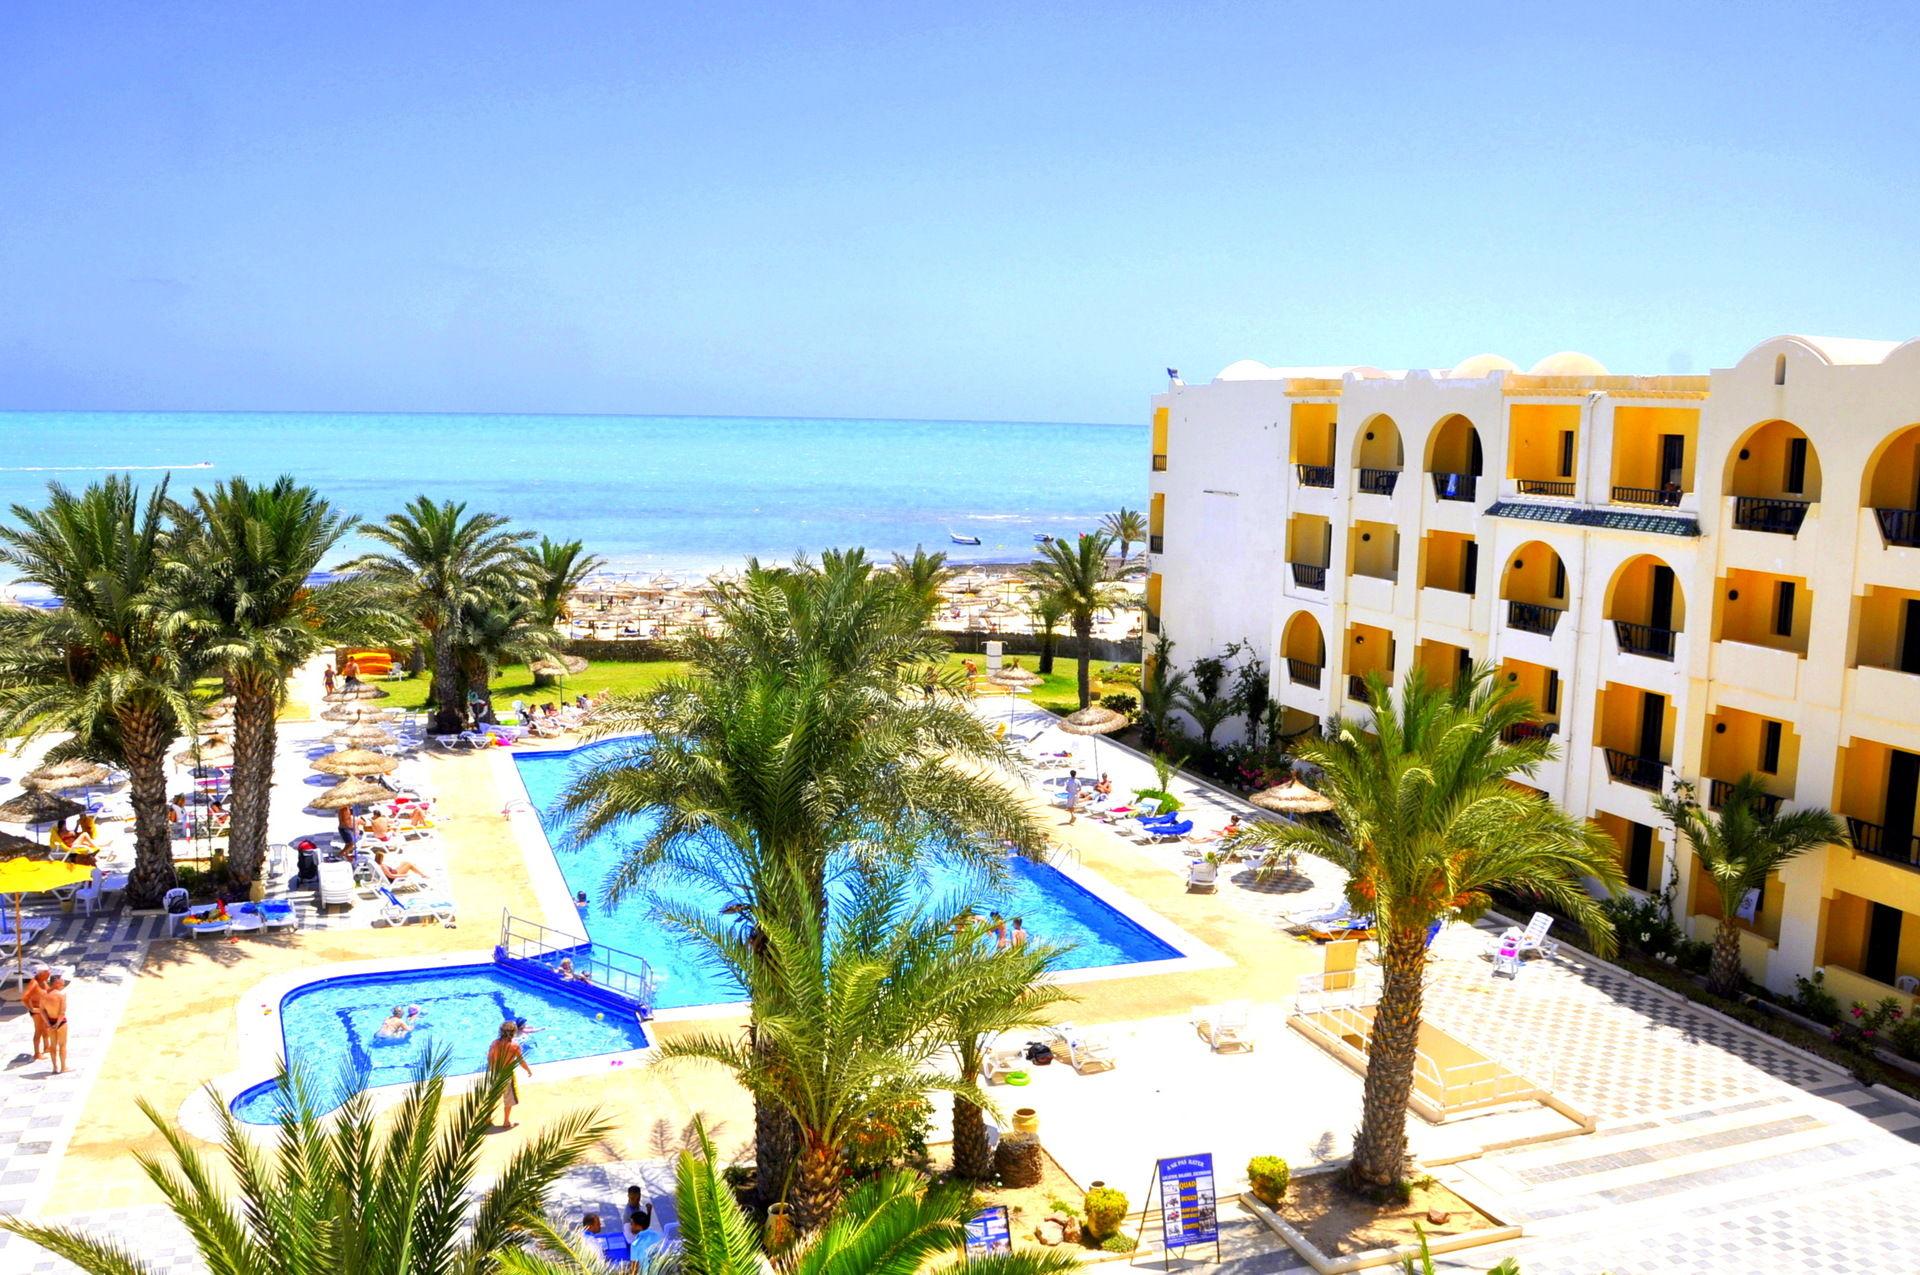 Hôtel club diana beach 3*